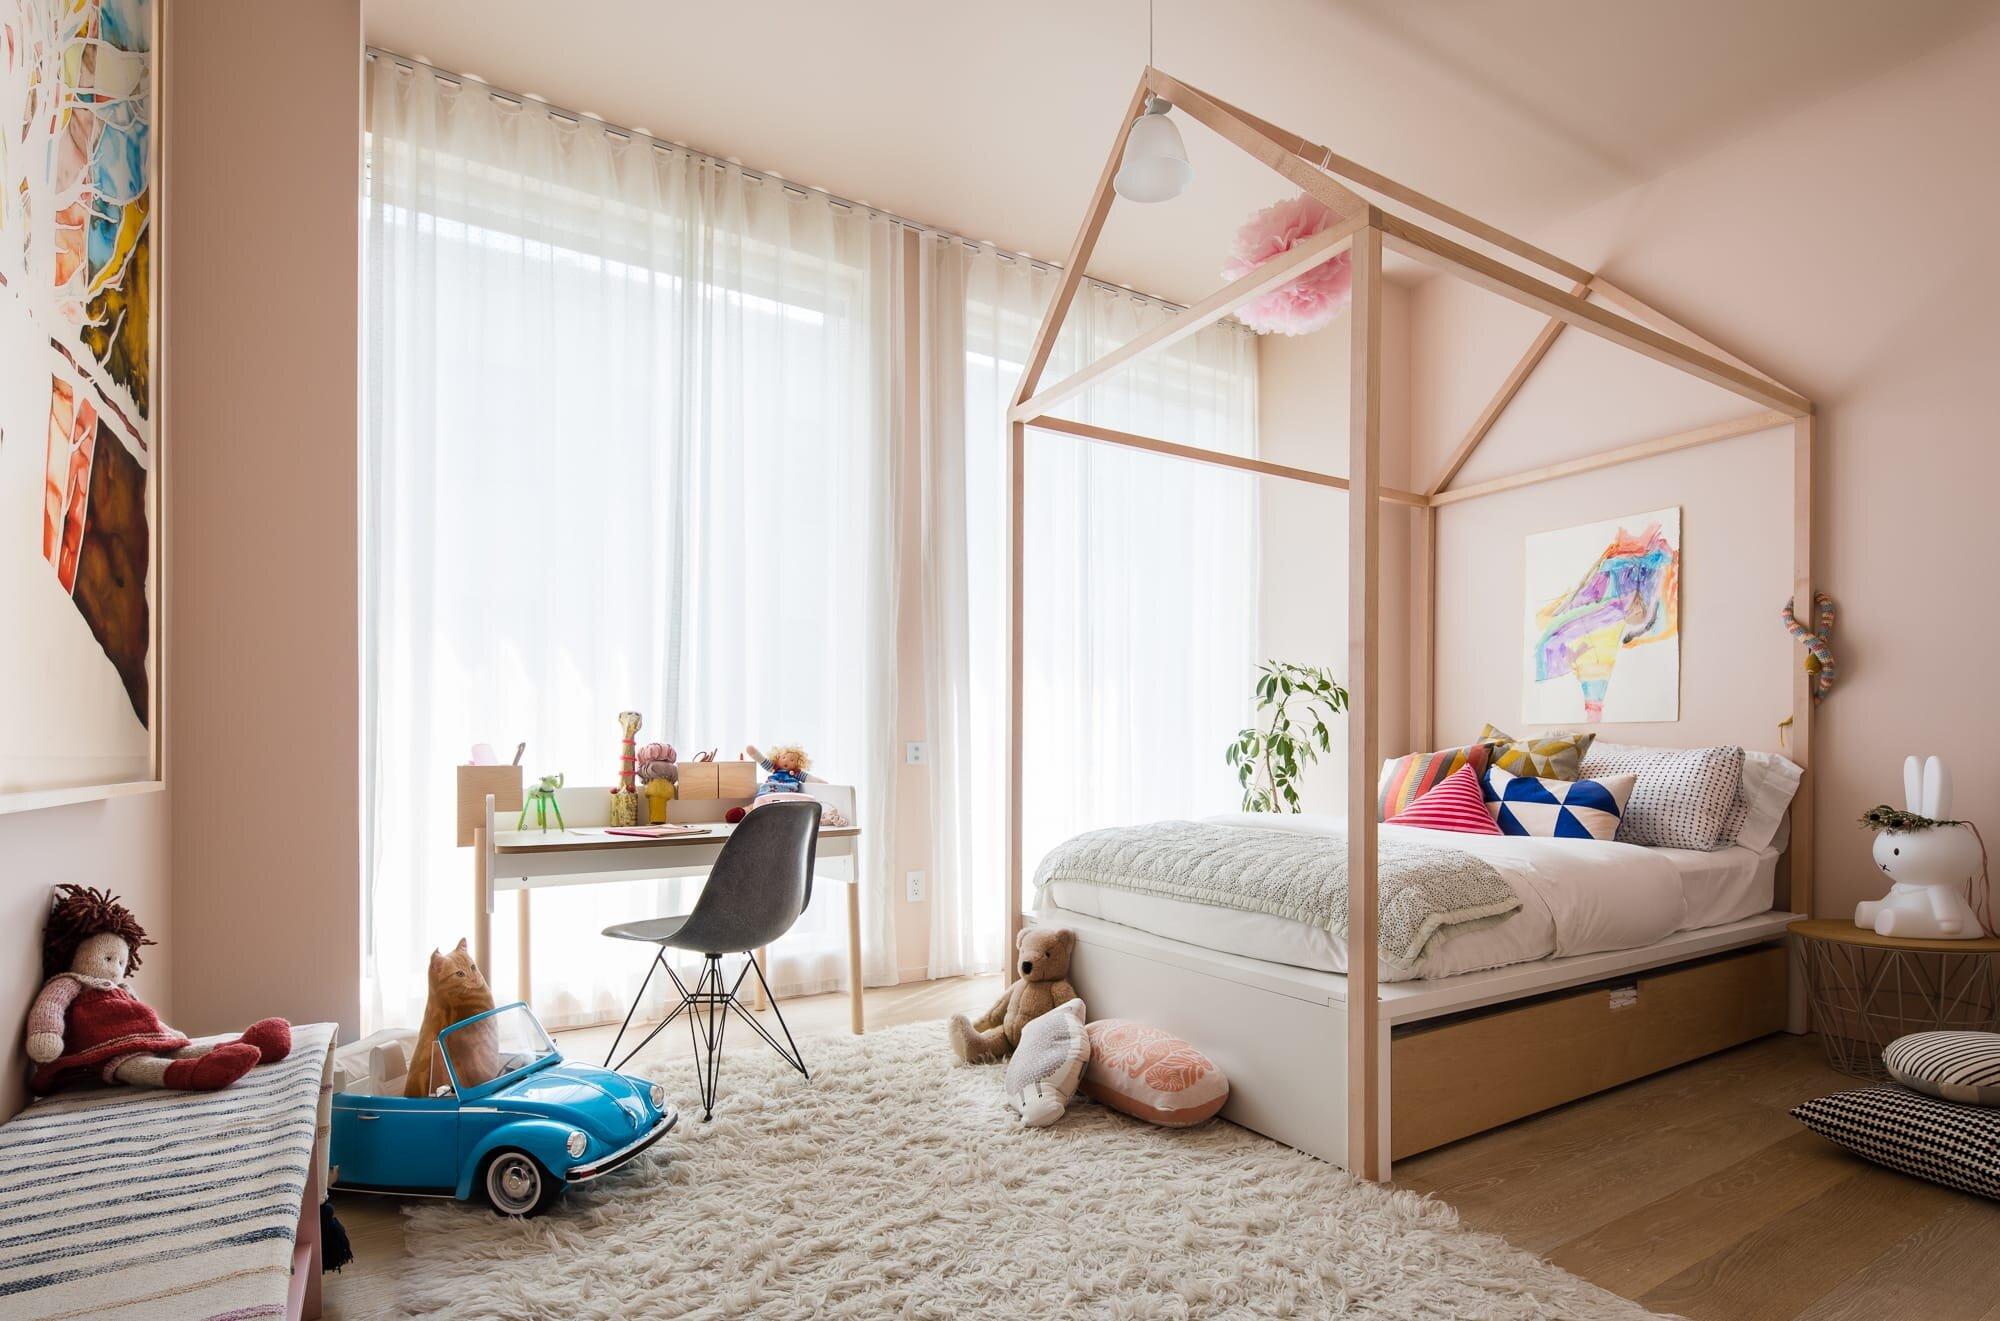 Second Kids bedroom designed by Alloy Development